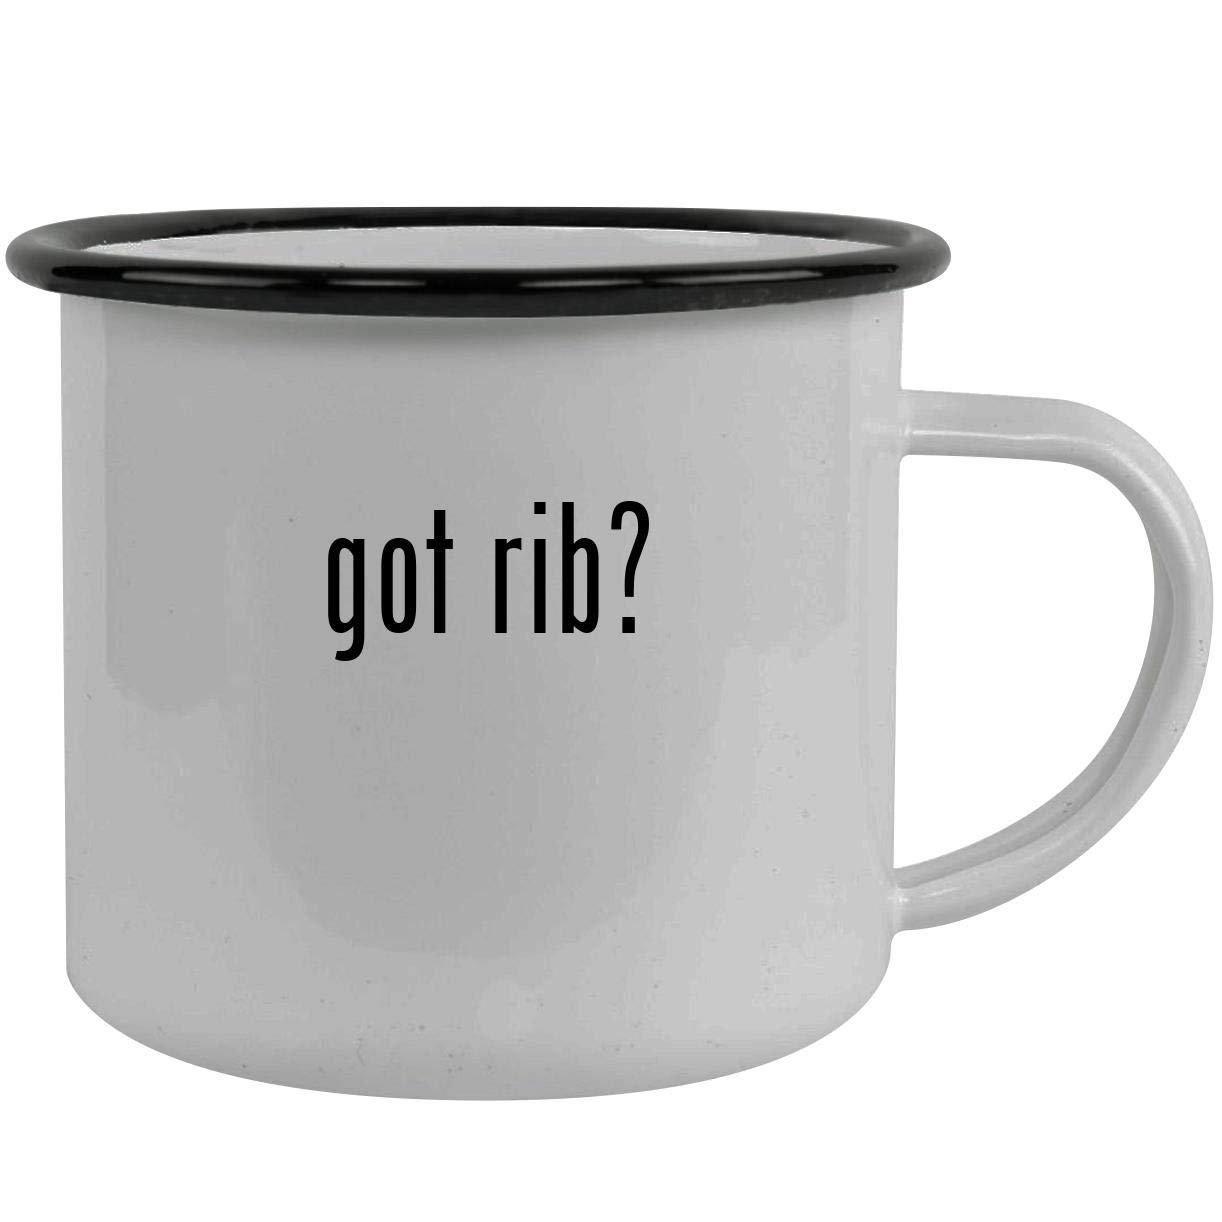 got rib? - Stainless Steel 12oz Camping Mug, Black